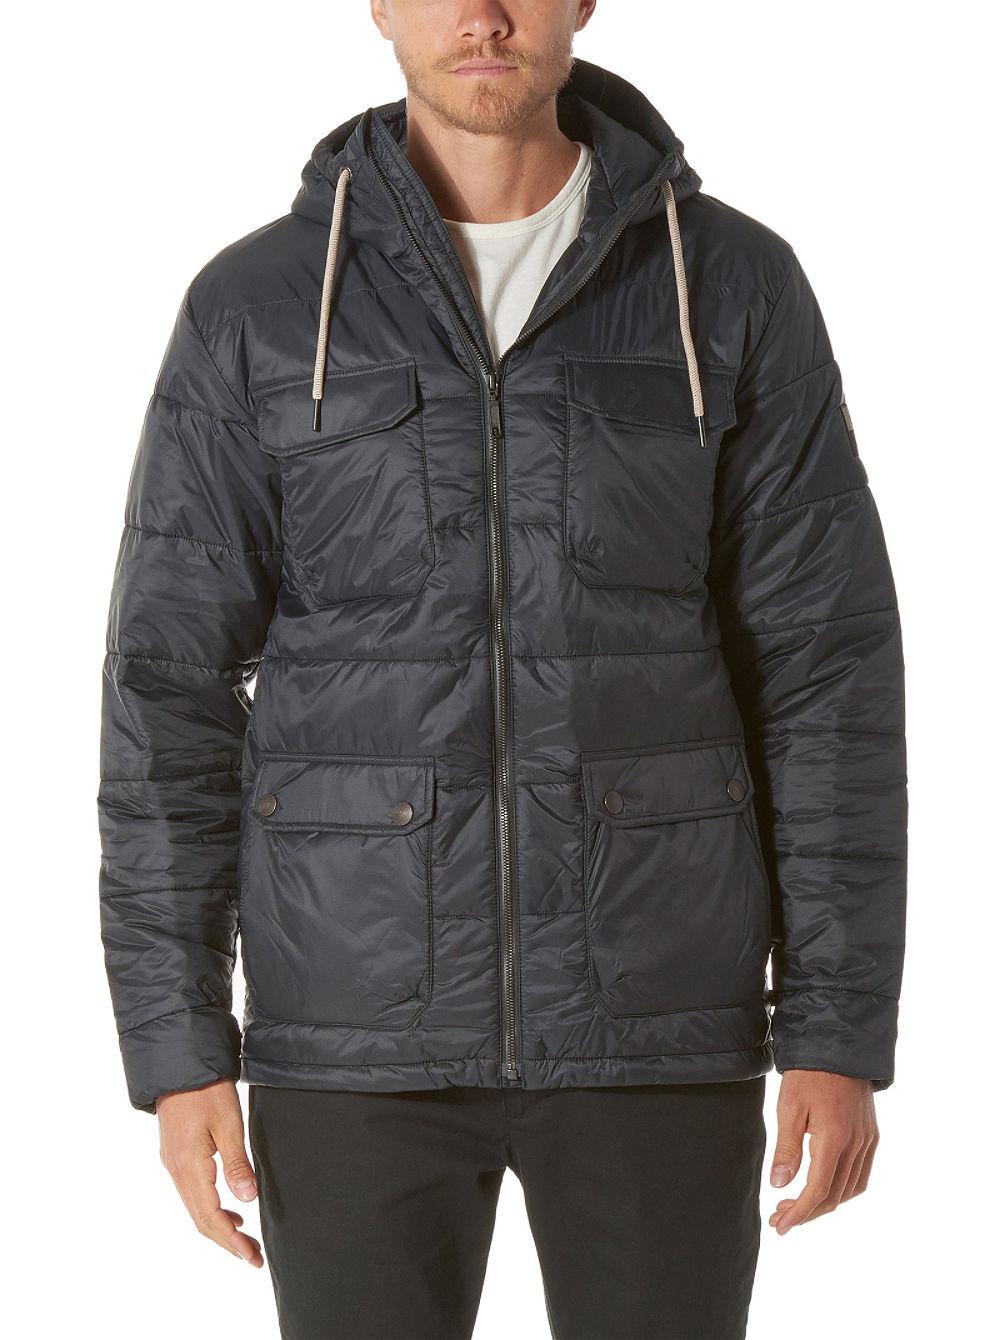 reef-alliance-jacket